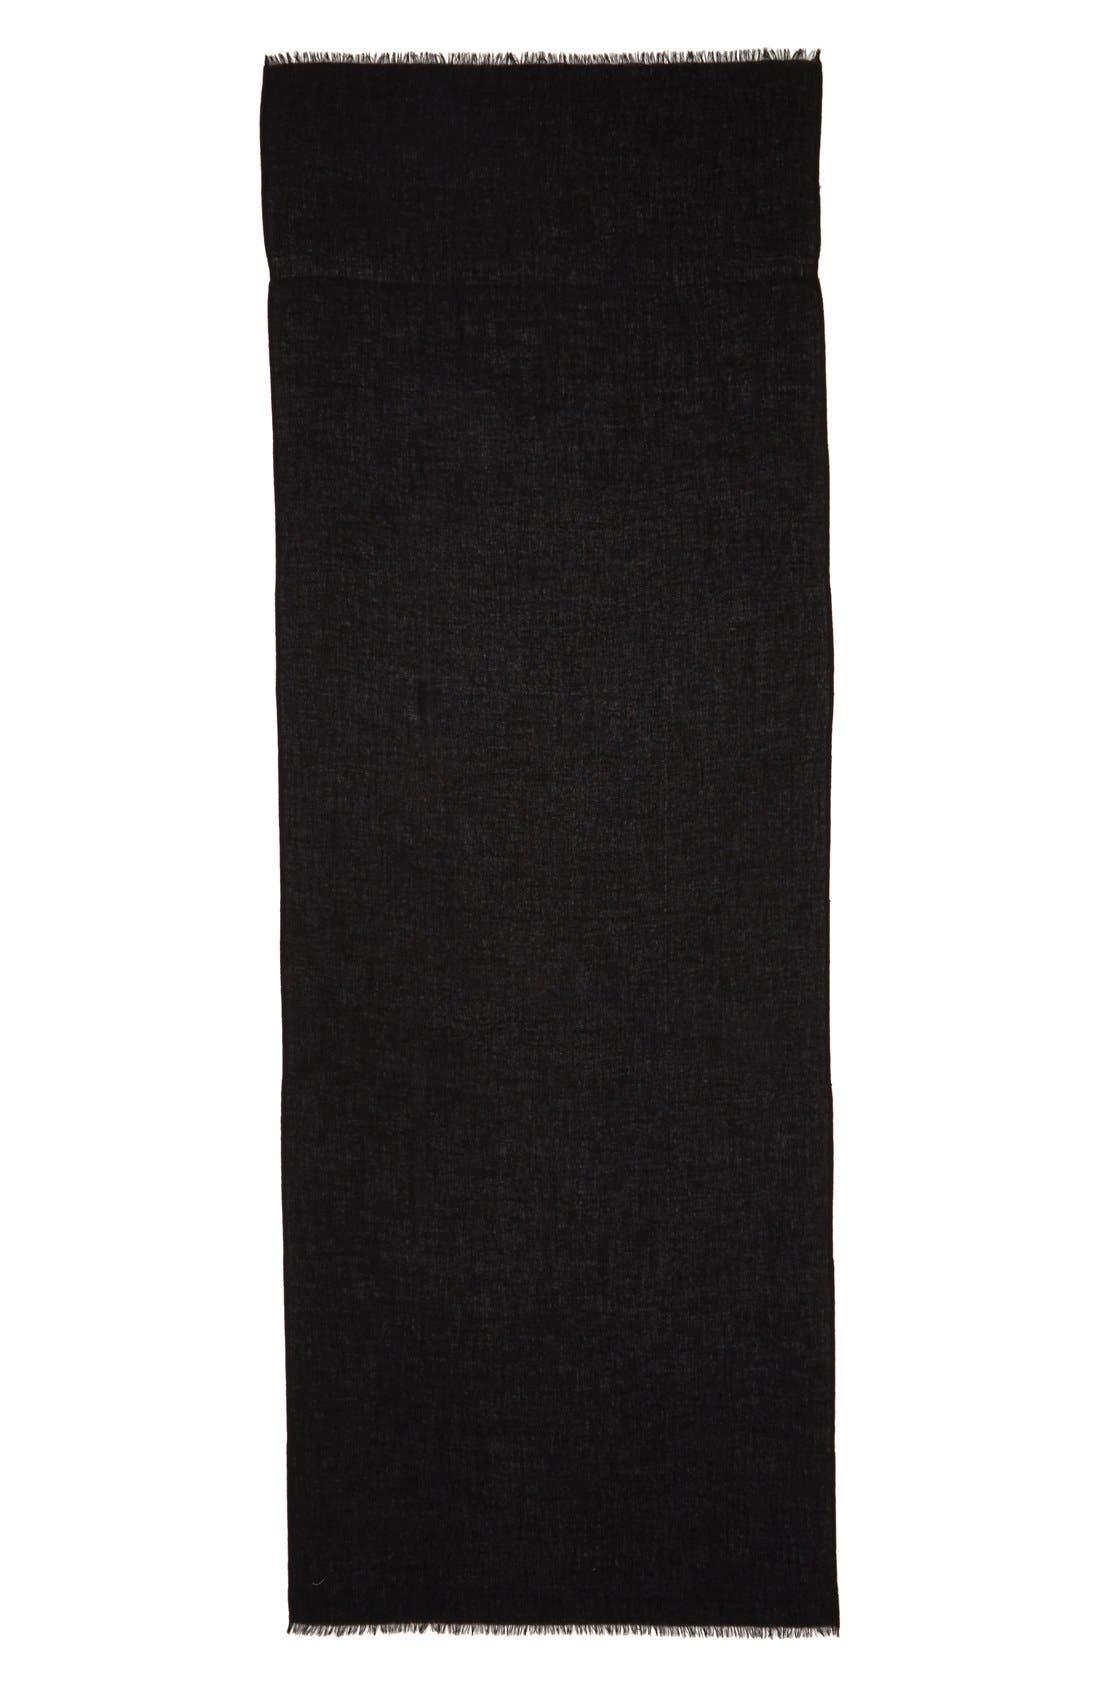 NORDSTROM, Wool & Cashmere Wrap, Alternate thumbnail 2, color, 001